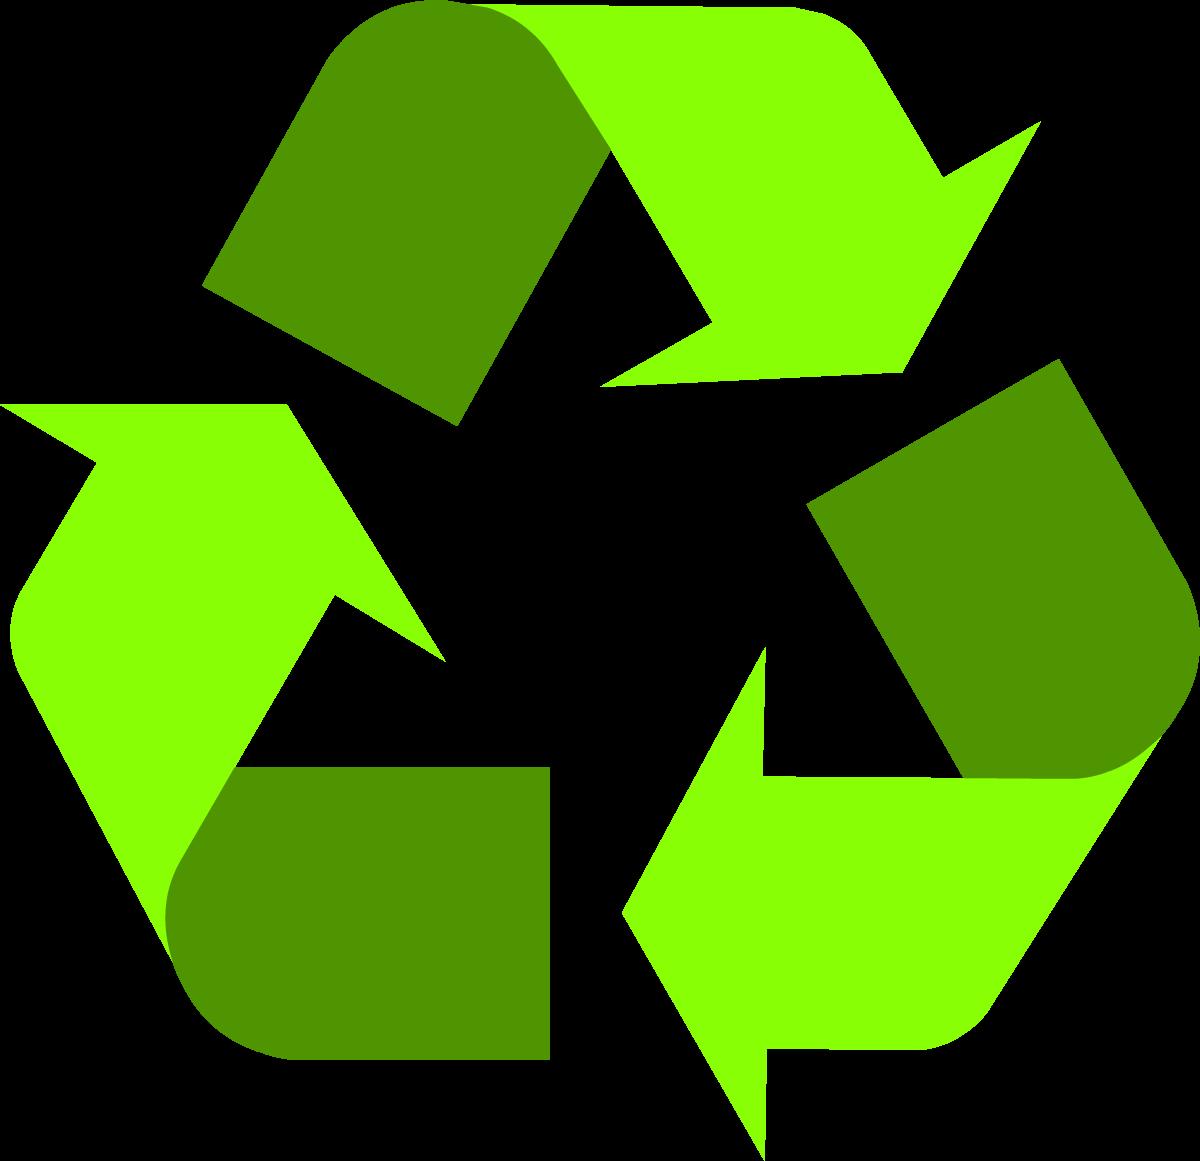 Download Recycling Symbol The Original Recycle Logo Recyclen Symbolen Flessendopwerkjes